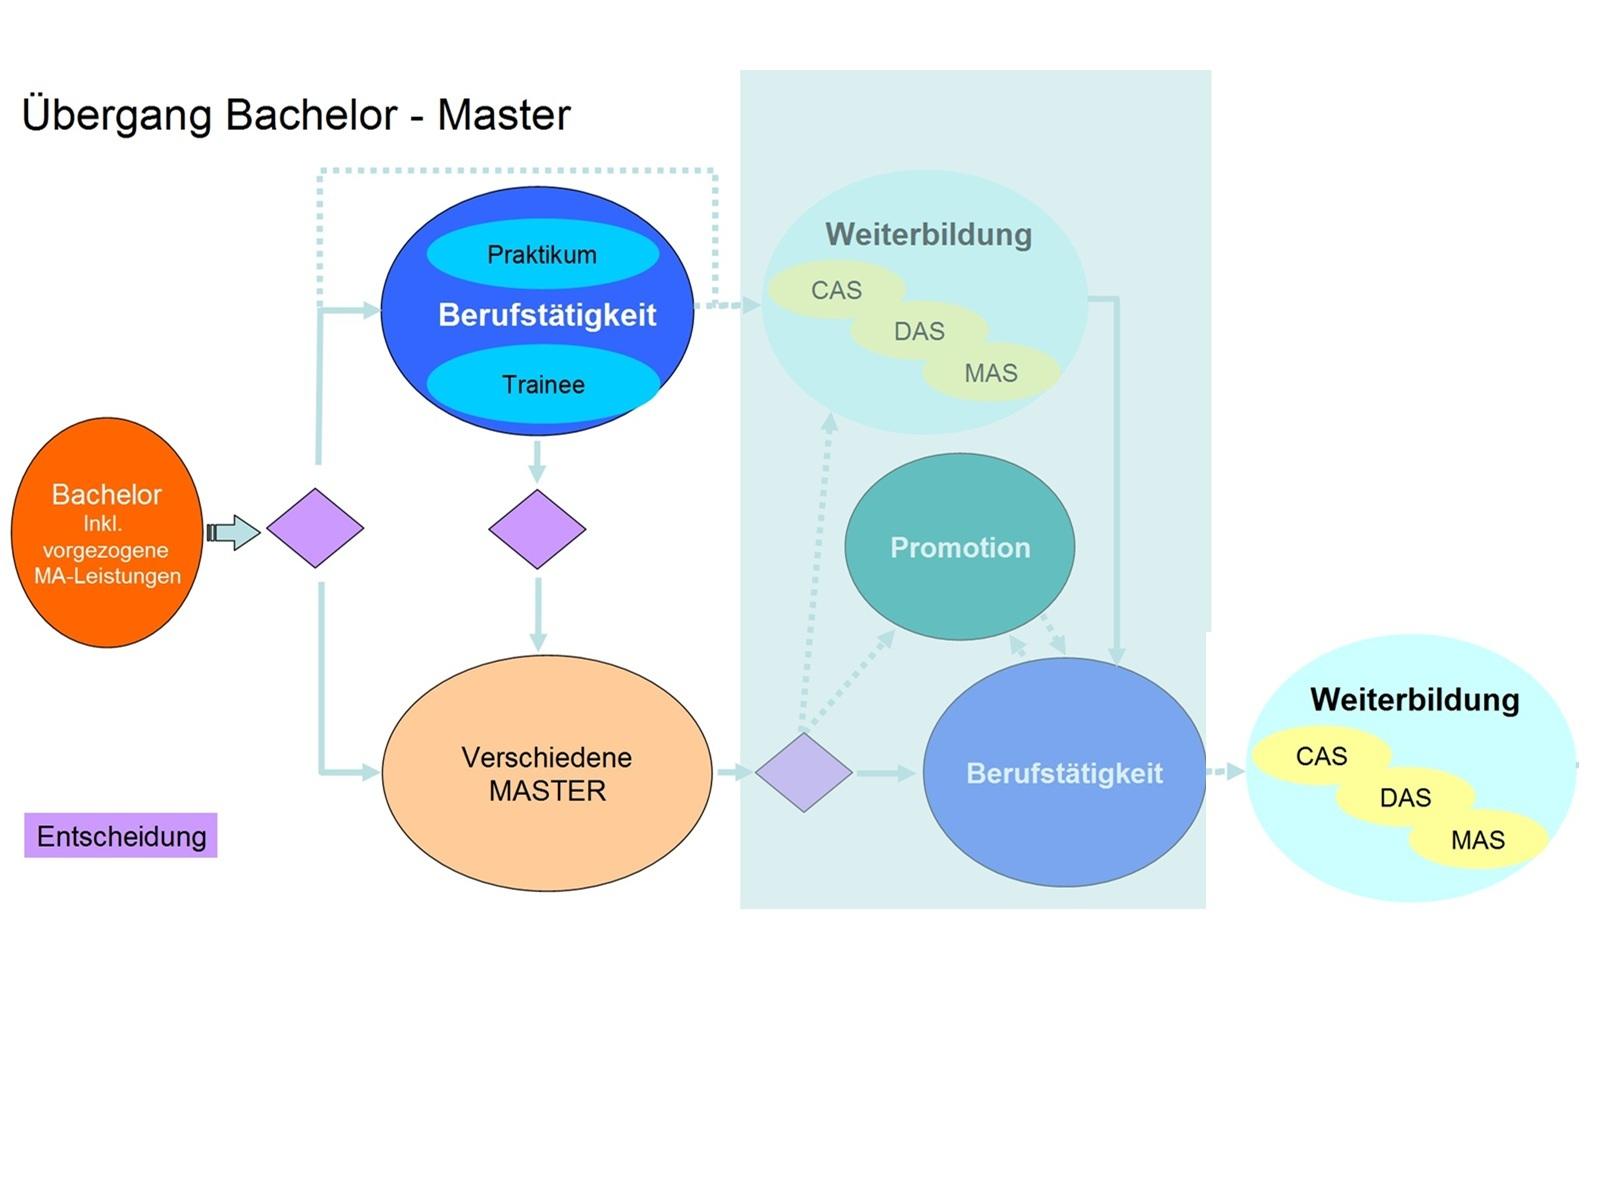 Entscheidungswege am Übergang BA-MA